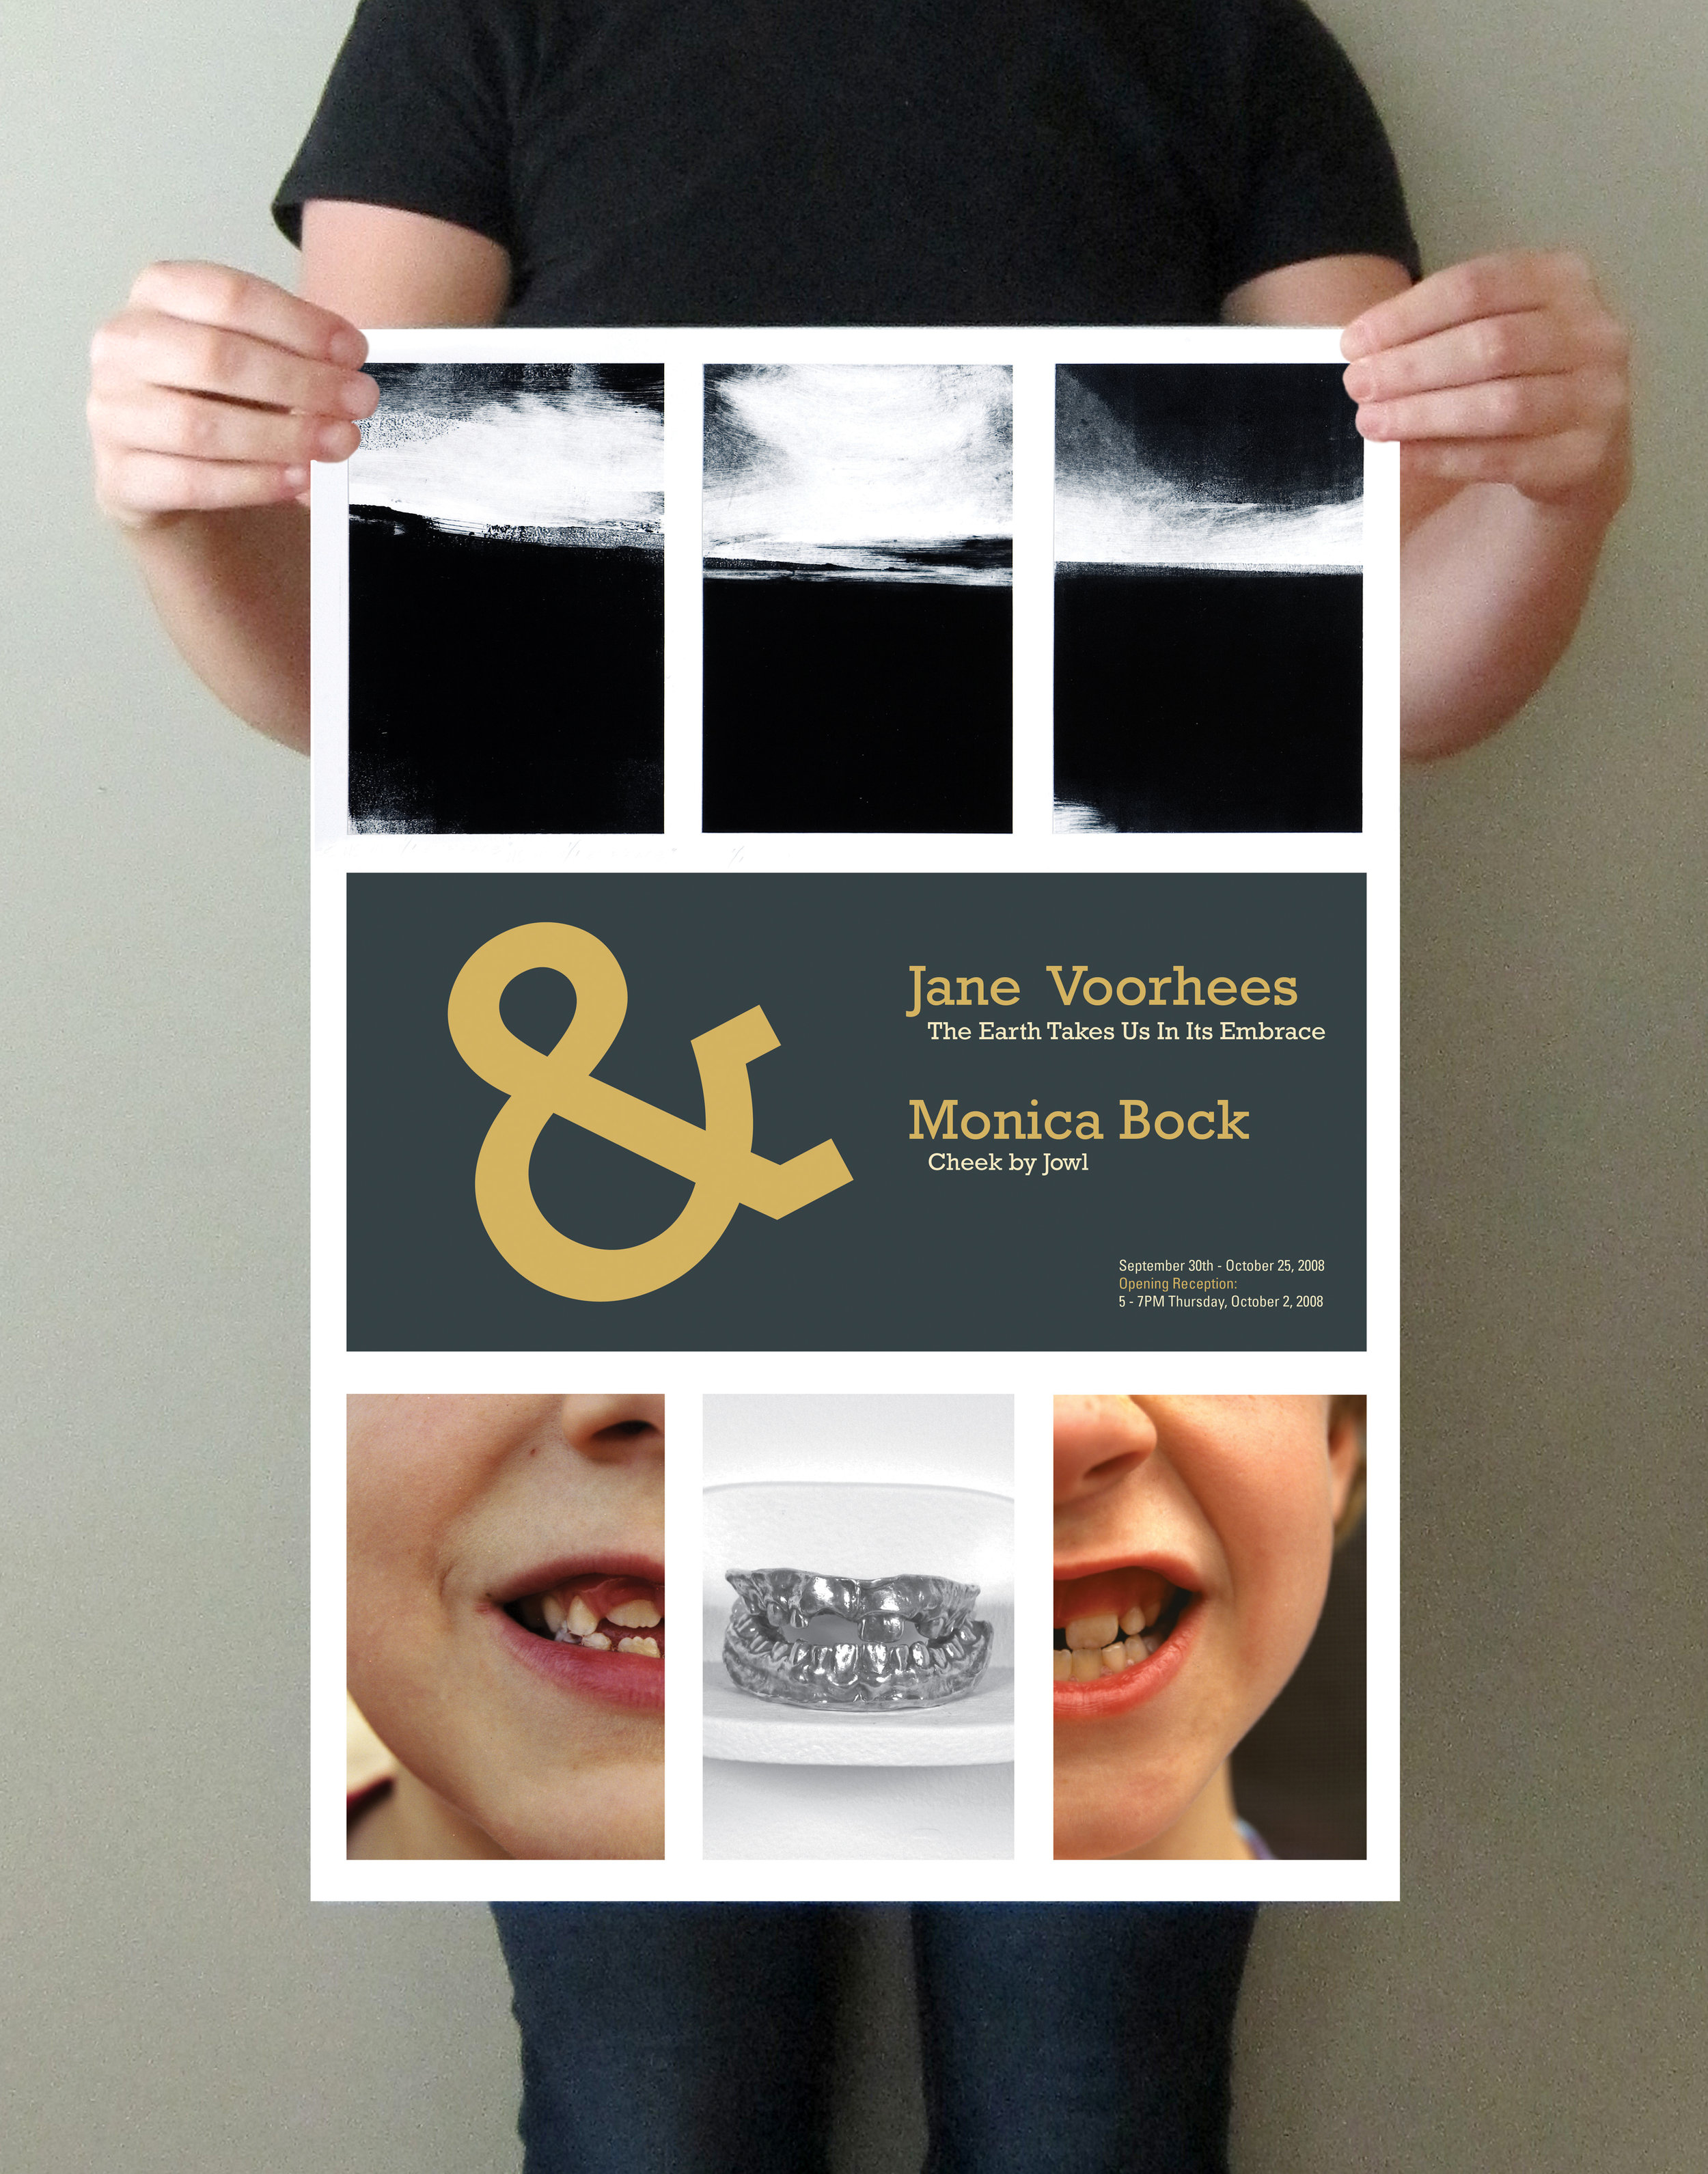 Voorhees | Bock Art Opening Poster & Card